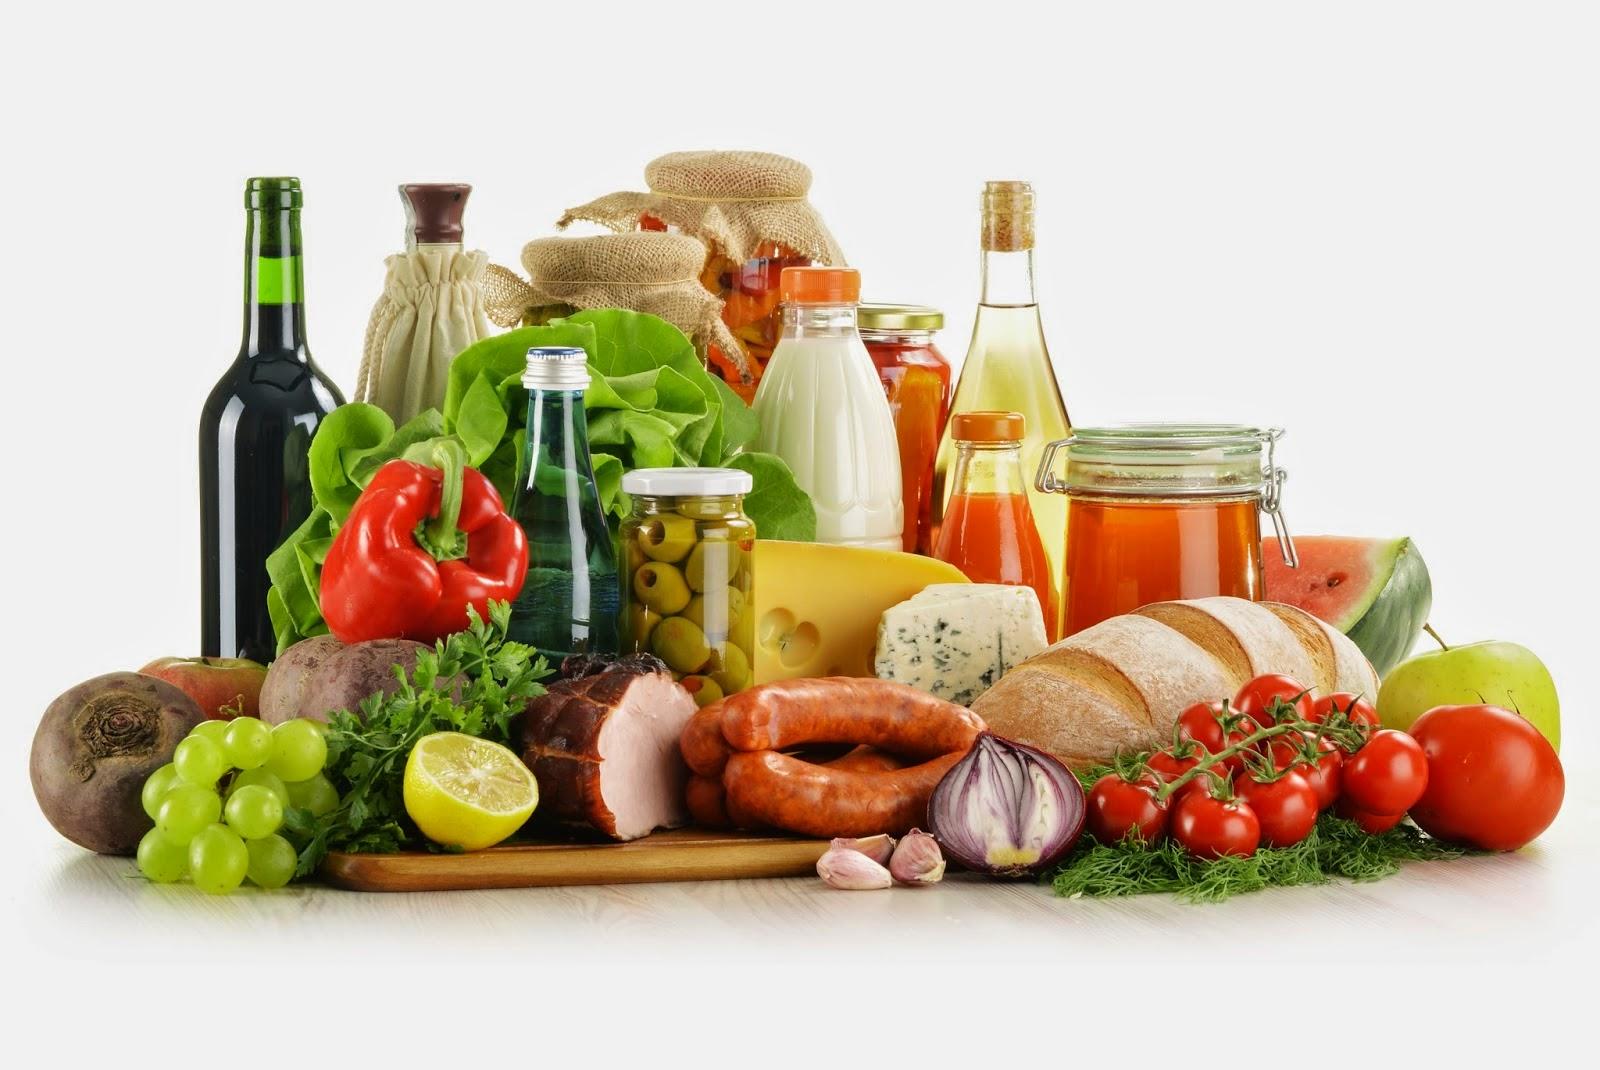 Alimentos de dieta balanceada